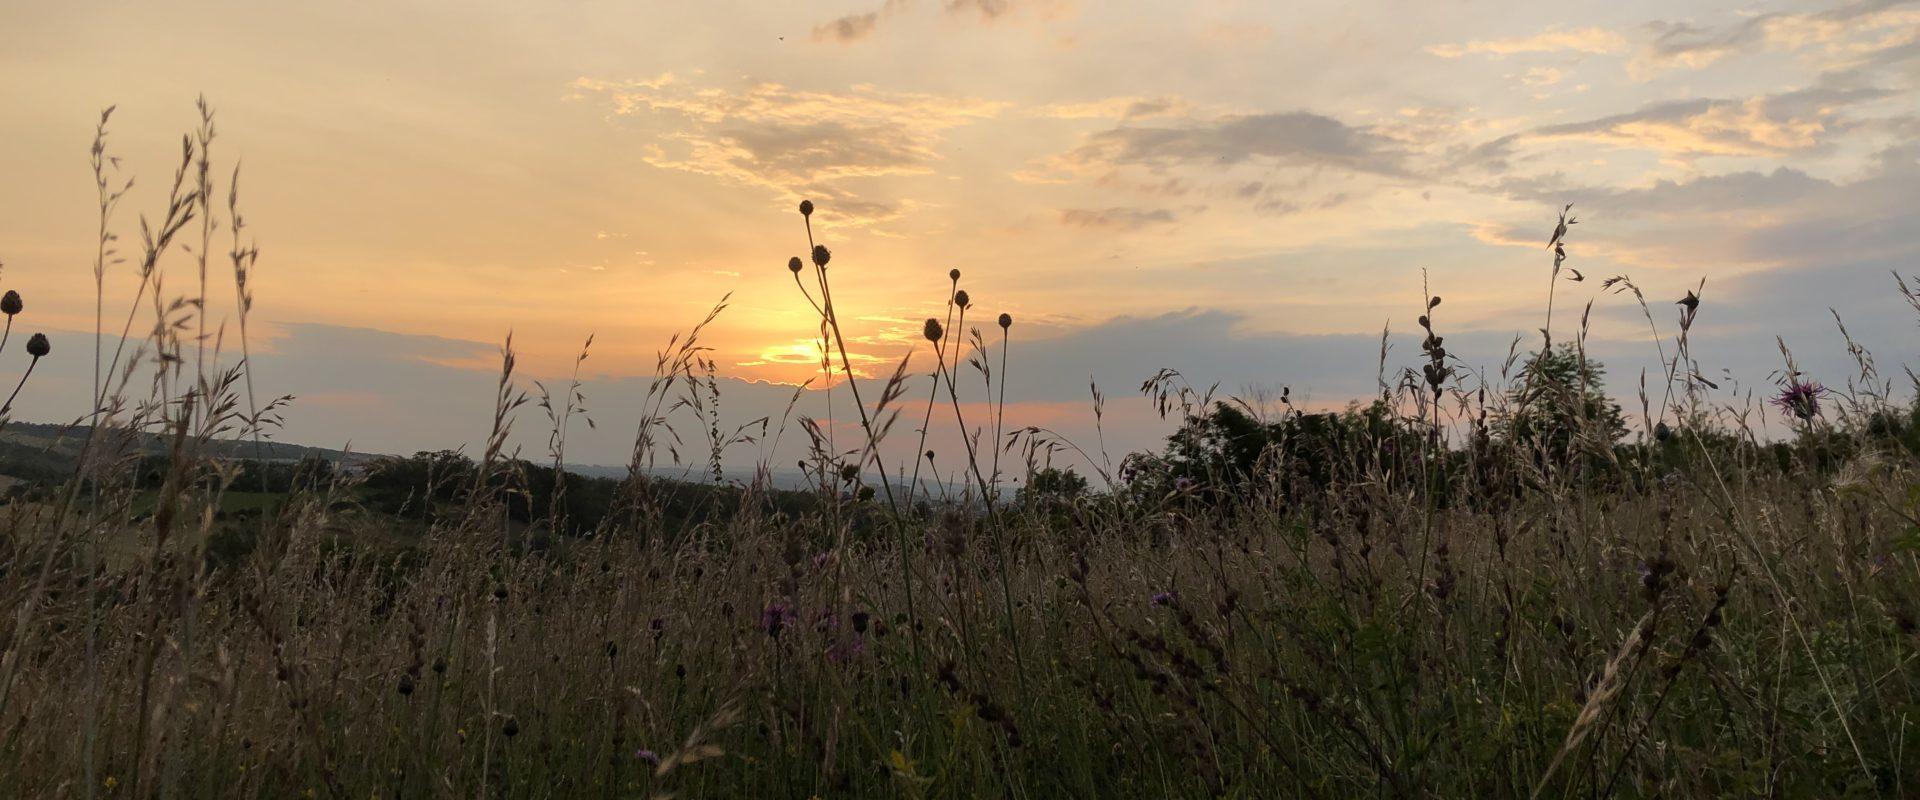 Sonnenuntergang überm Feld